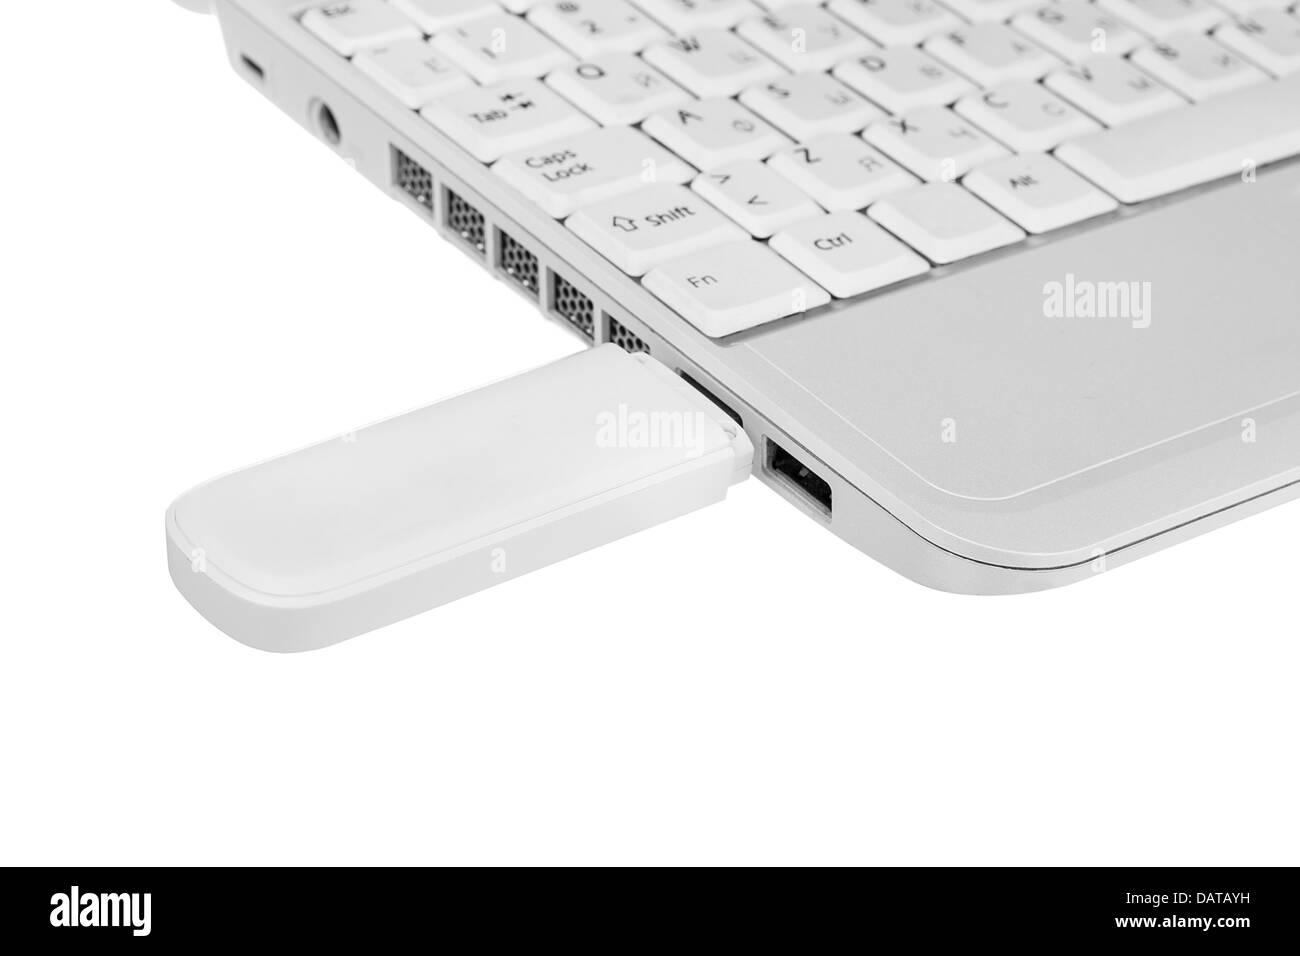 Les ordinateurs portables avec modem wi-fi Photo Stock